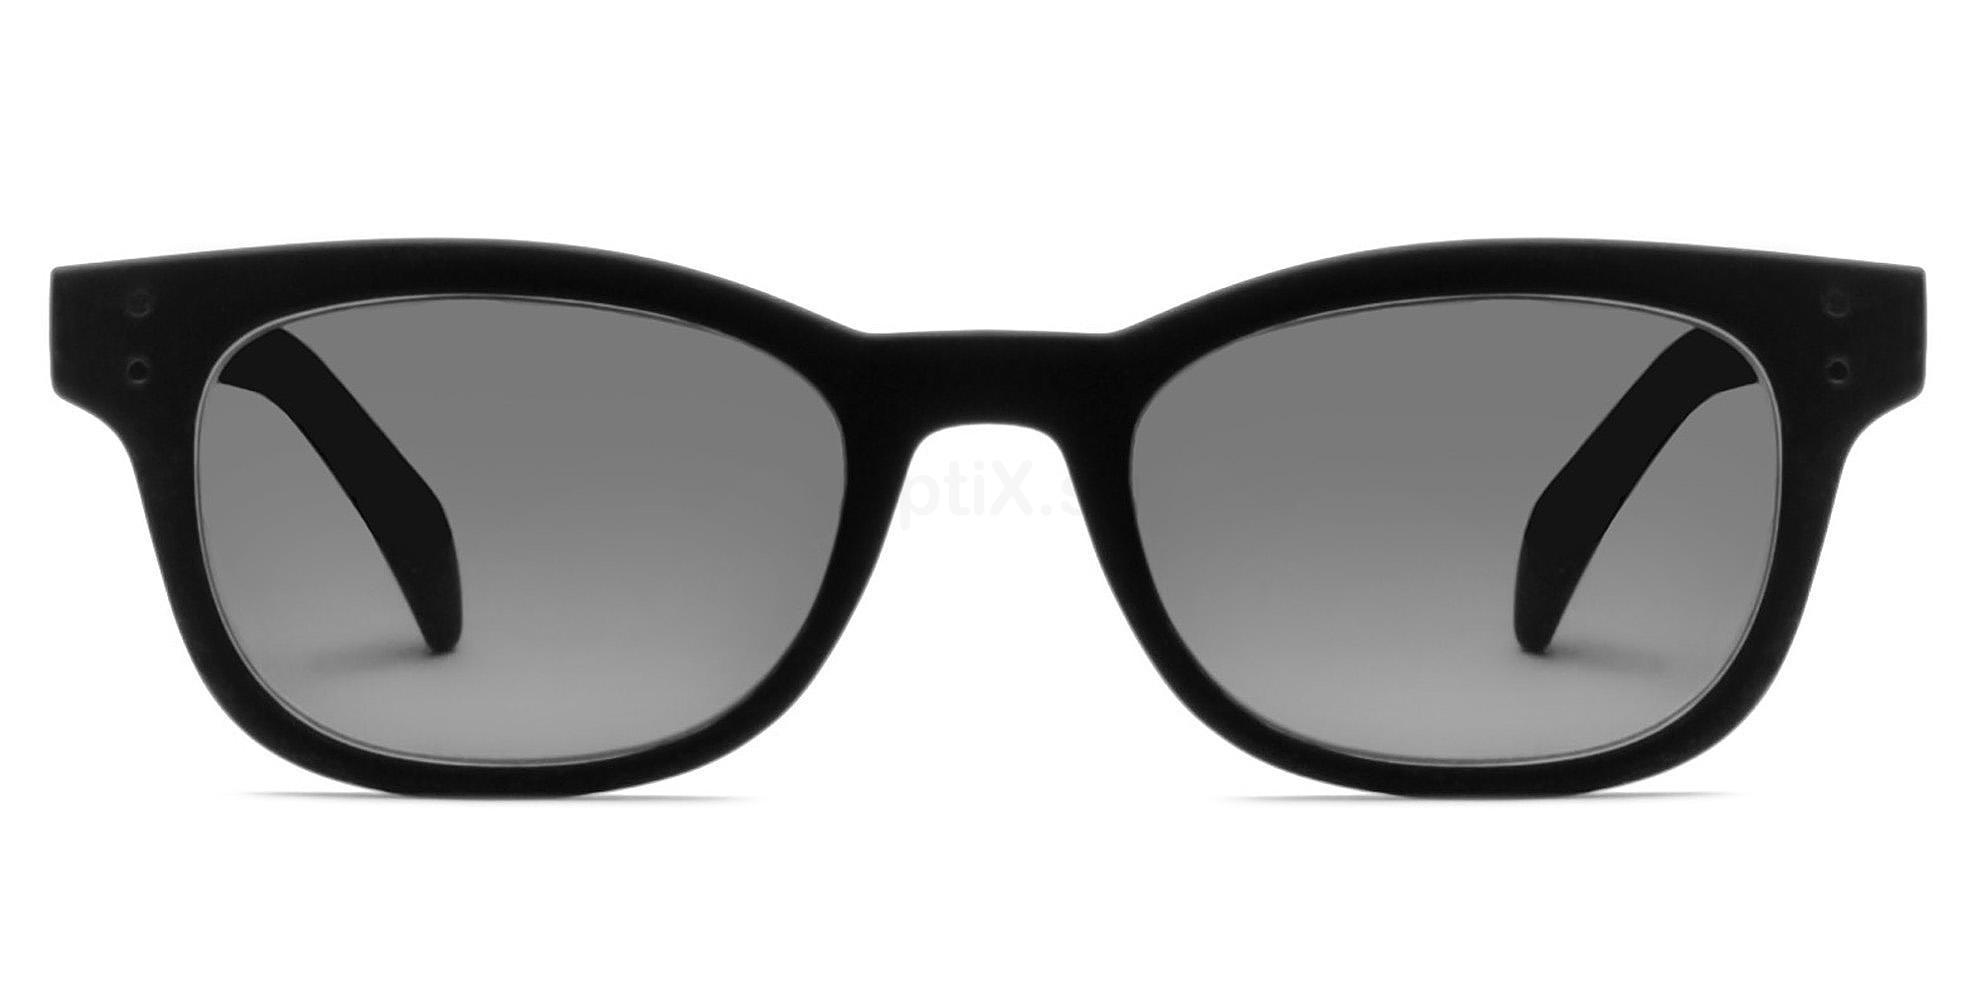 C02 Polarized Grey 2249 - Matte Black (Polarized) , Savannah